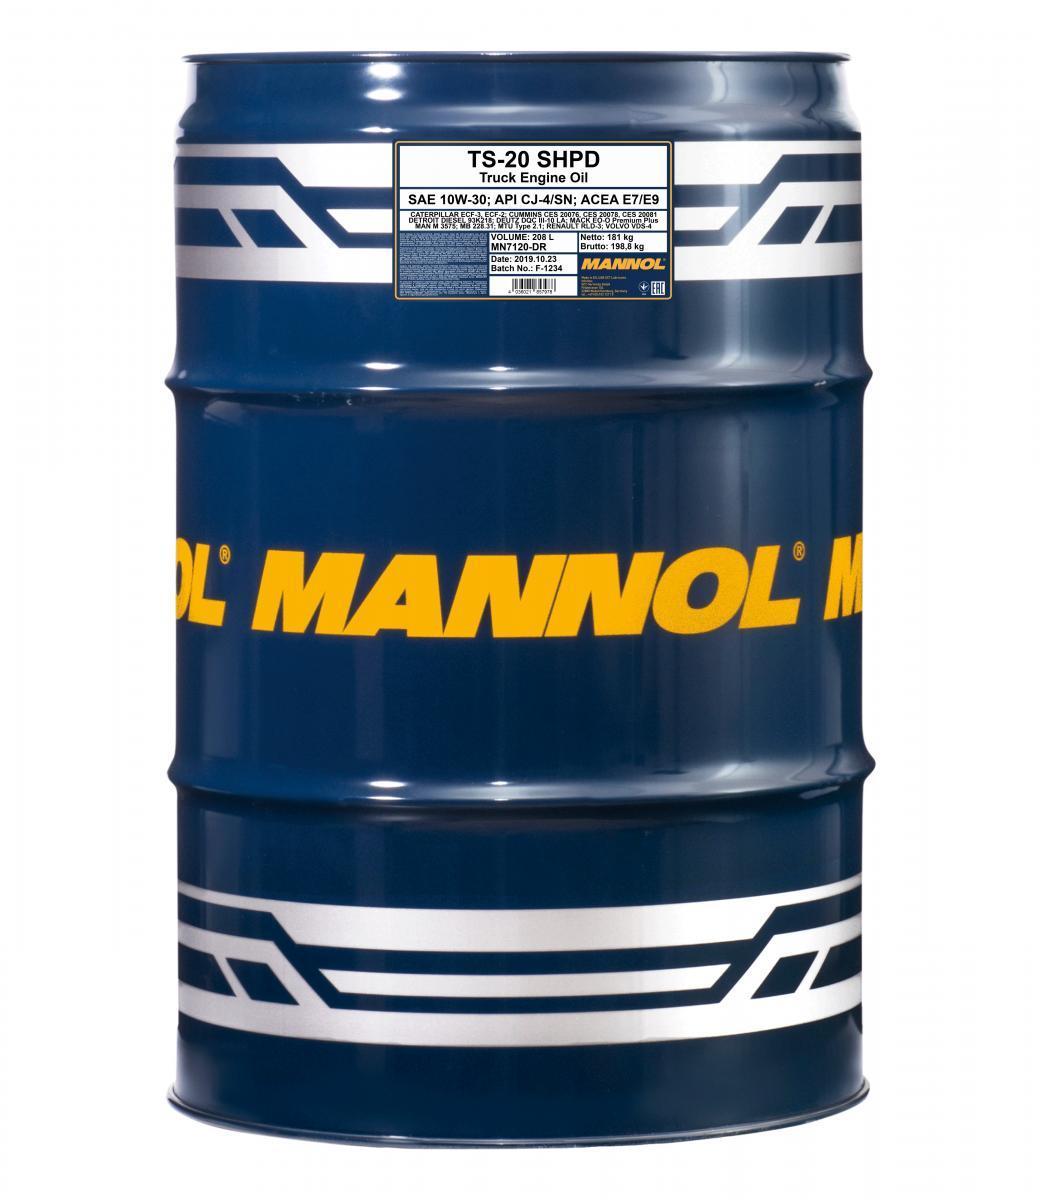 MN7120-Dr MANNOL TS-20, SHPD 10W-30, 10W-30, 208l Motoröl MN7120-Dr günstig kaufen